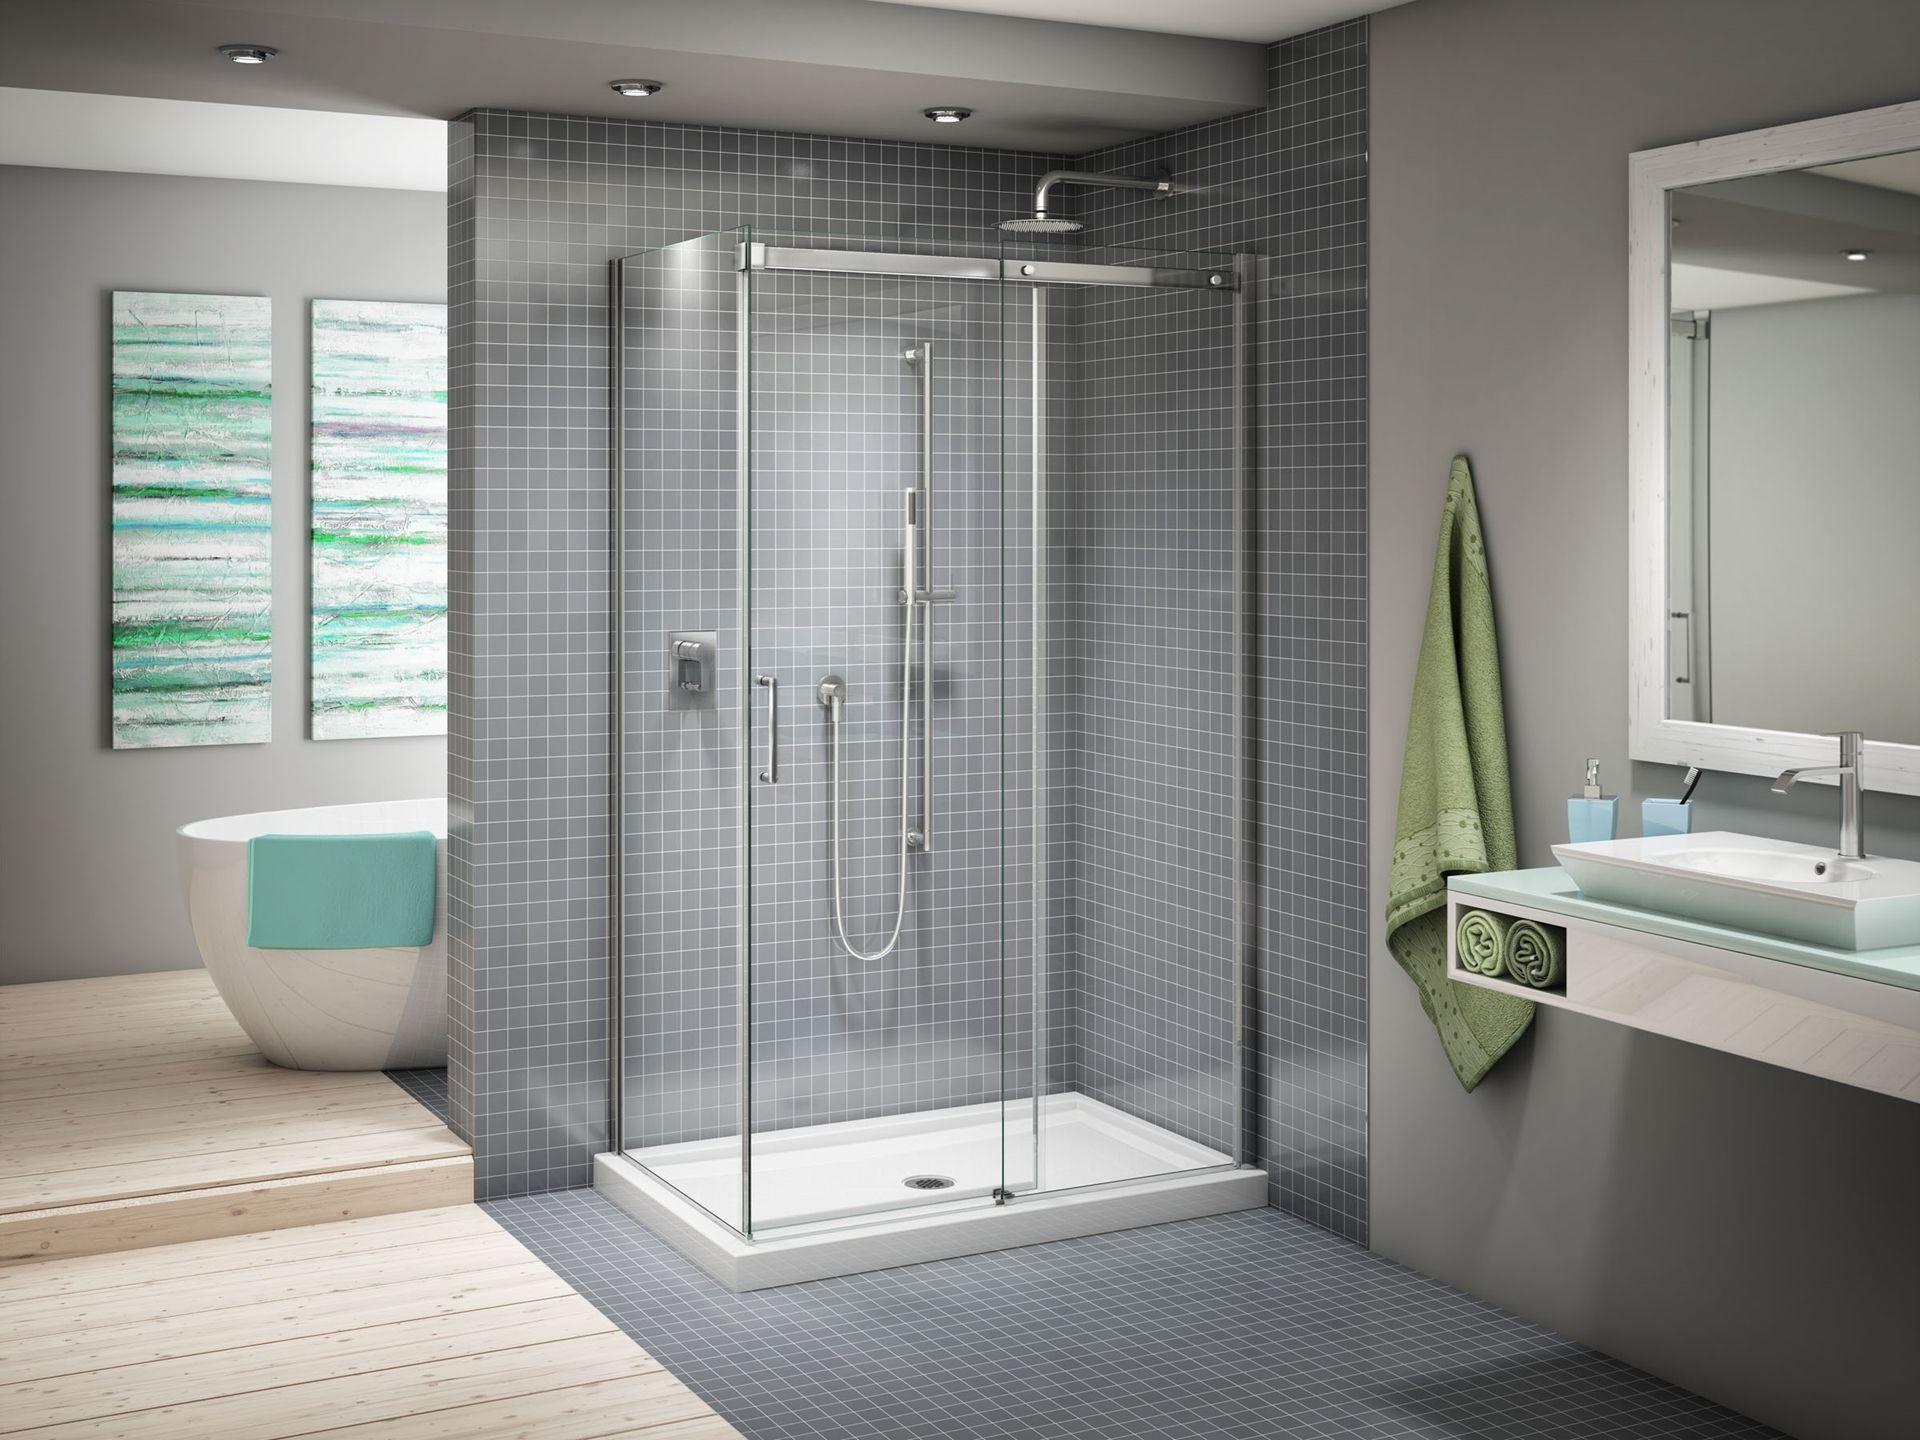 Fleurco Appolo Kit base et porte de douche coulissante en coin